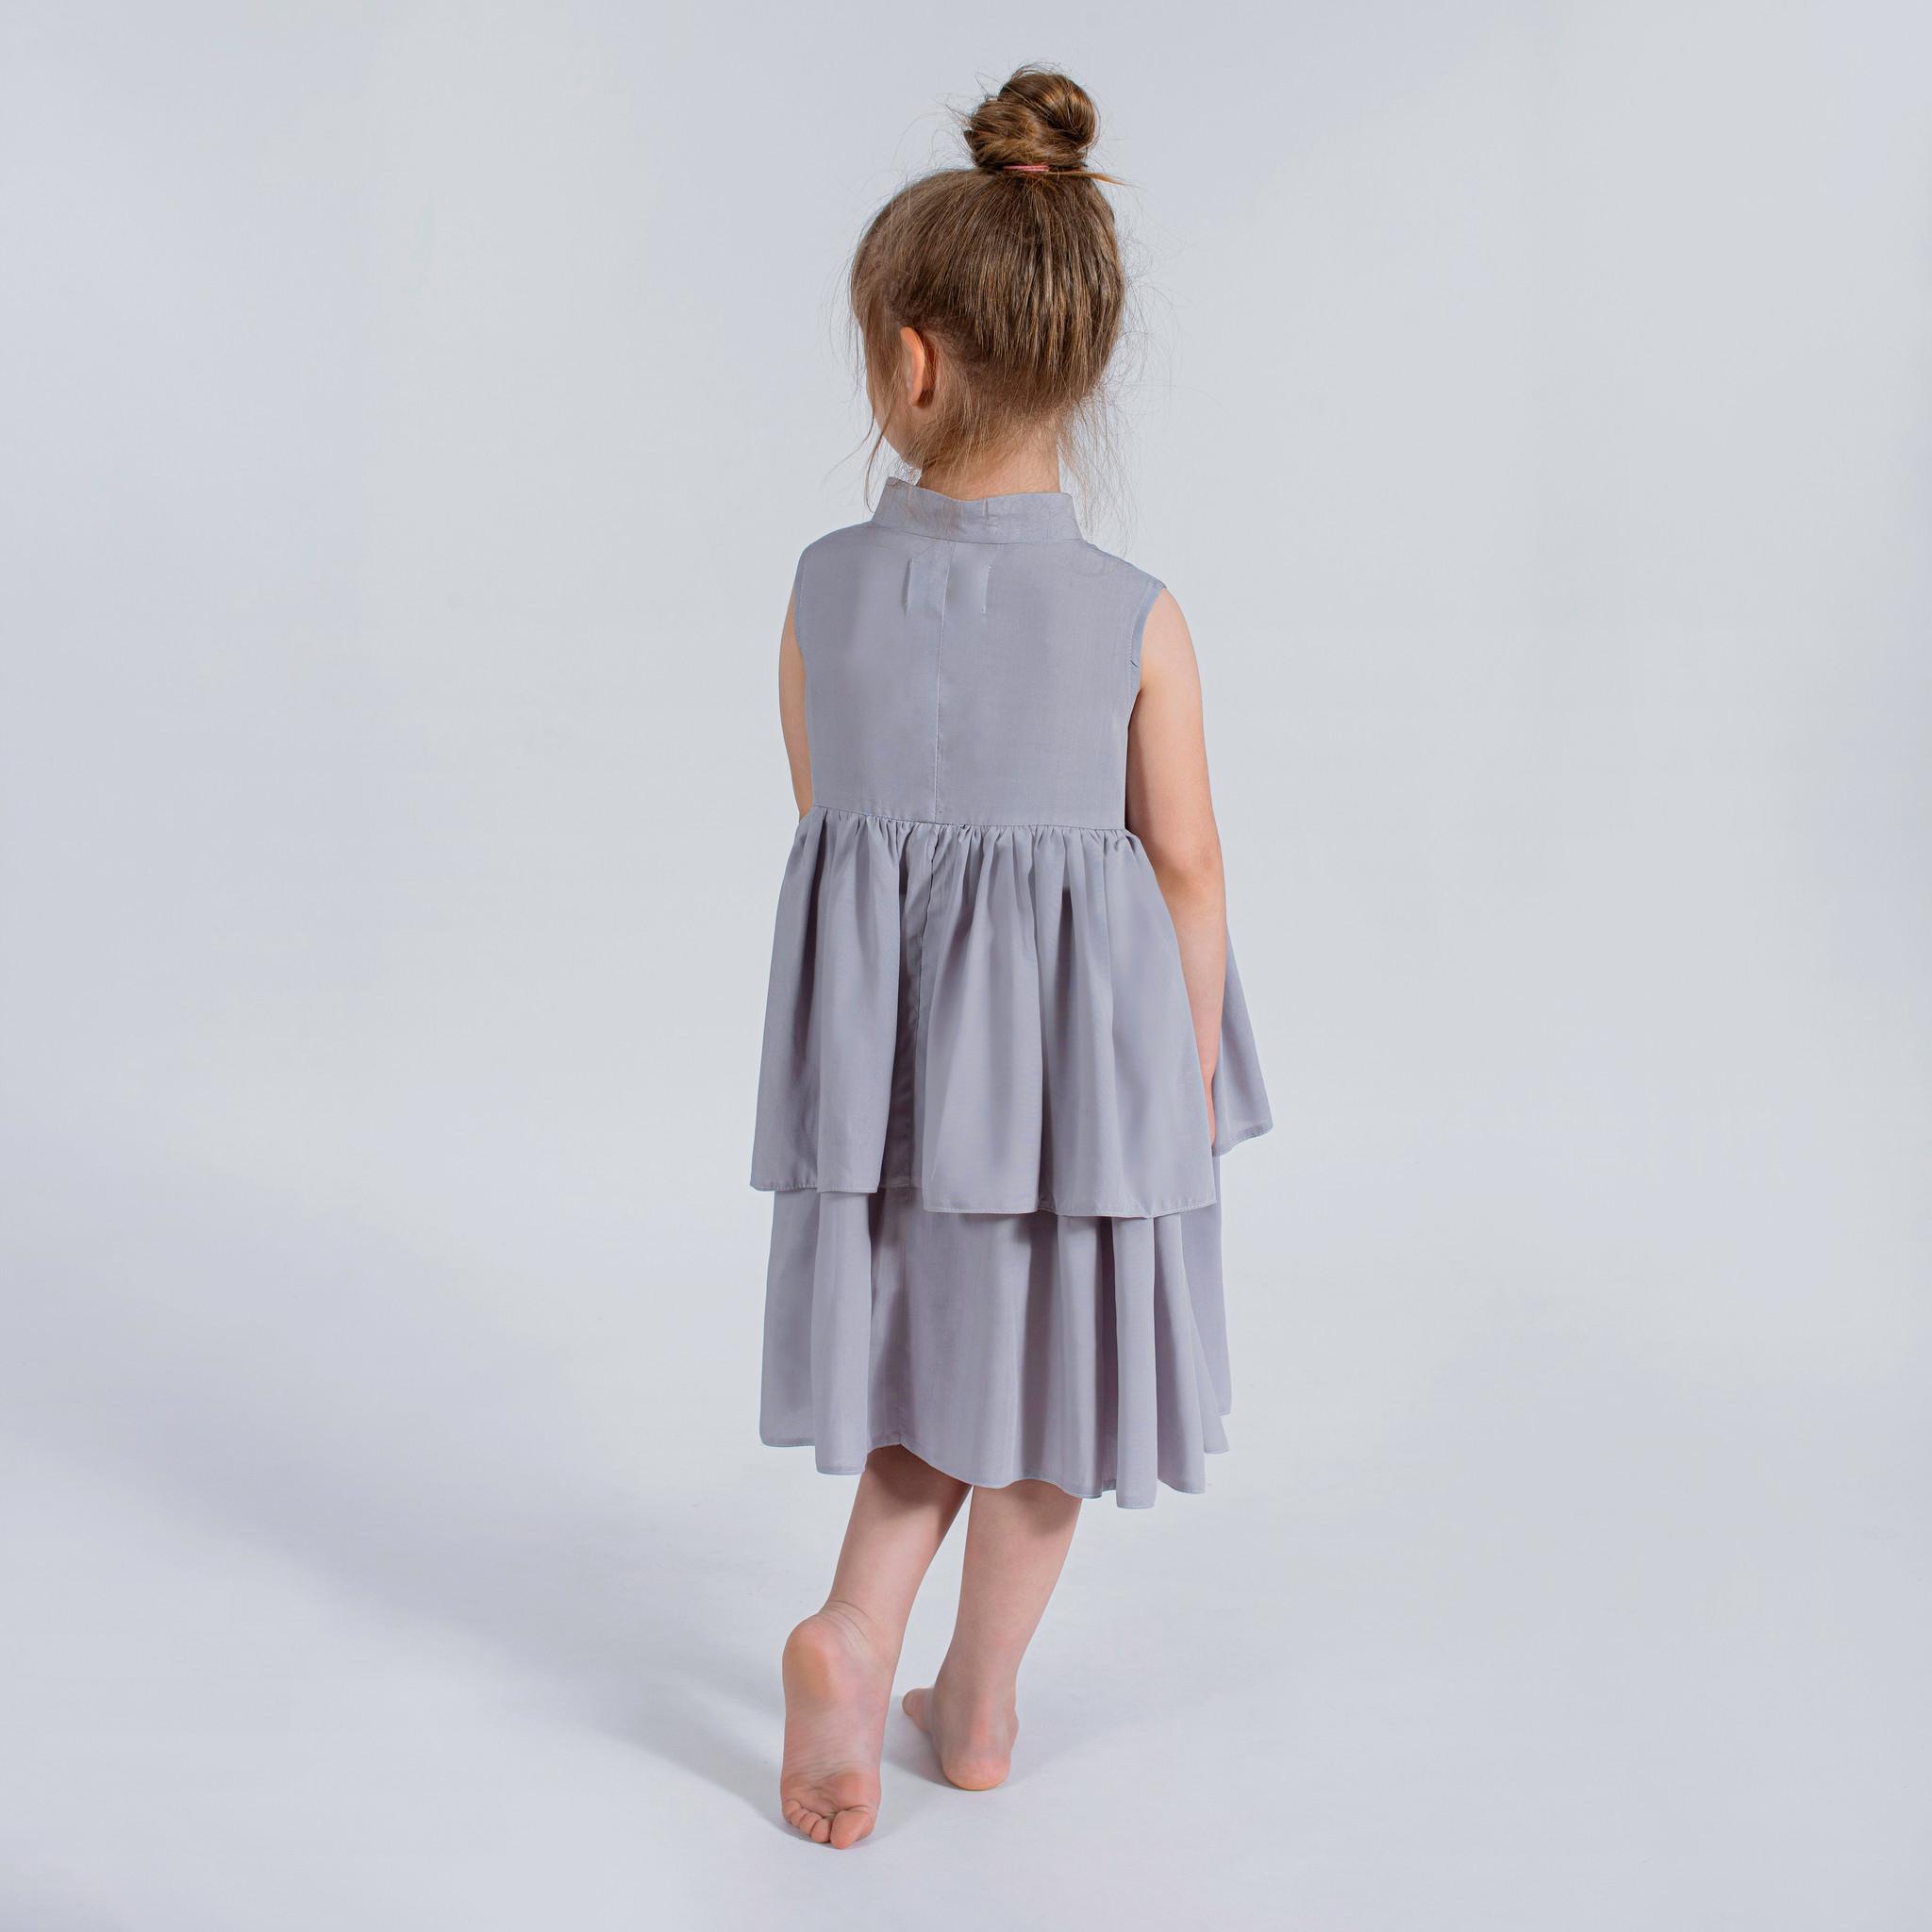 Sukienka srebrzysta - Domino.little.dress